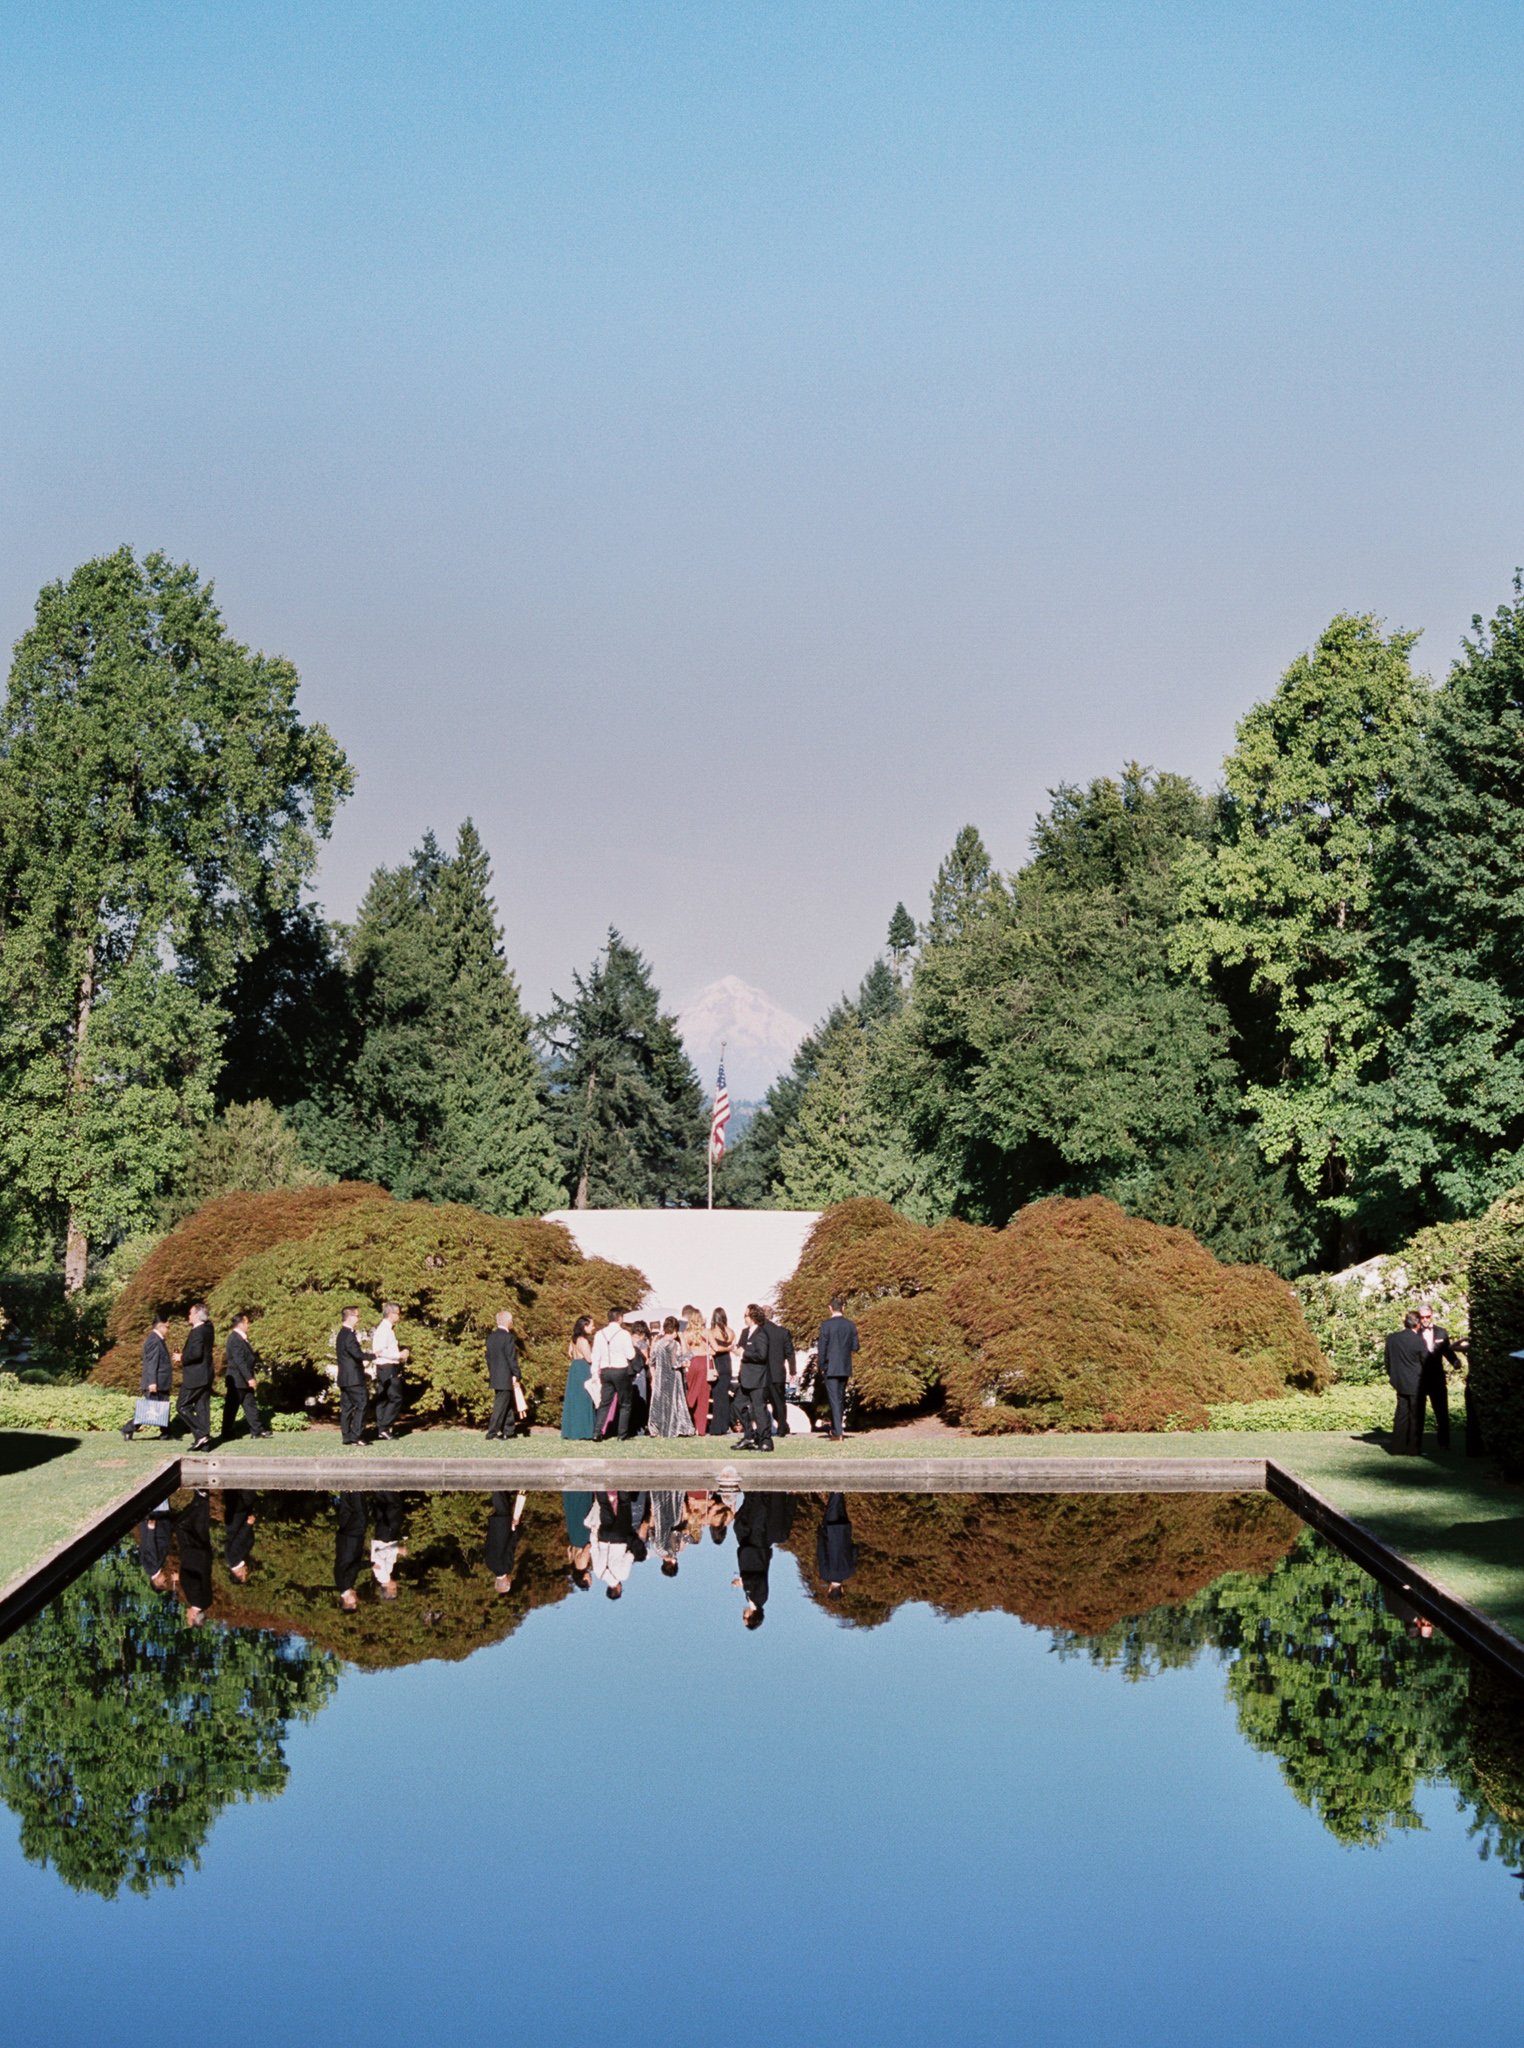 153OutliveCreative_Travel_Photographer_Videographer_Lewis&Clark_Oregon_Elegant_BlackTie_Destination_Wedding.jpg